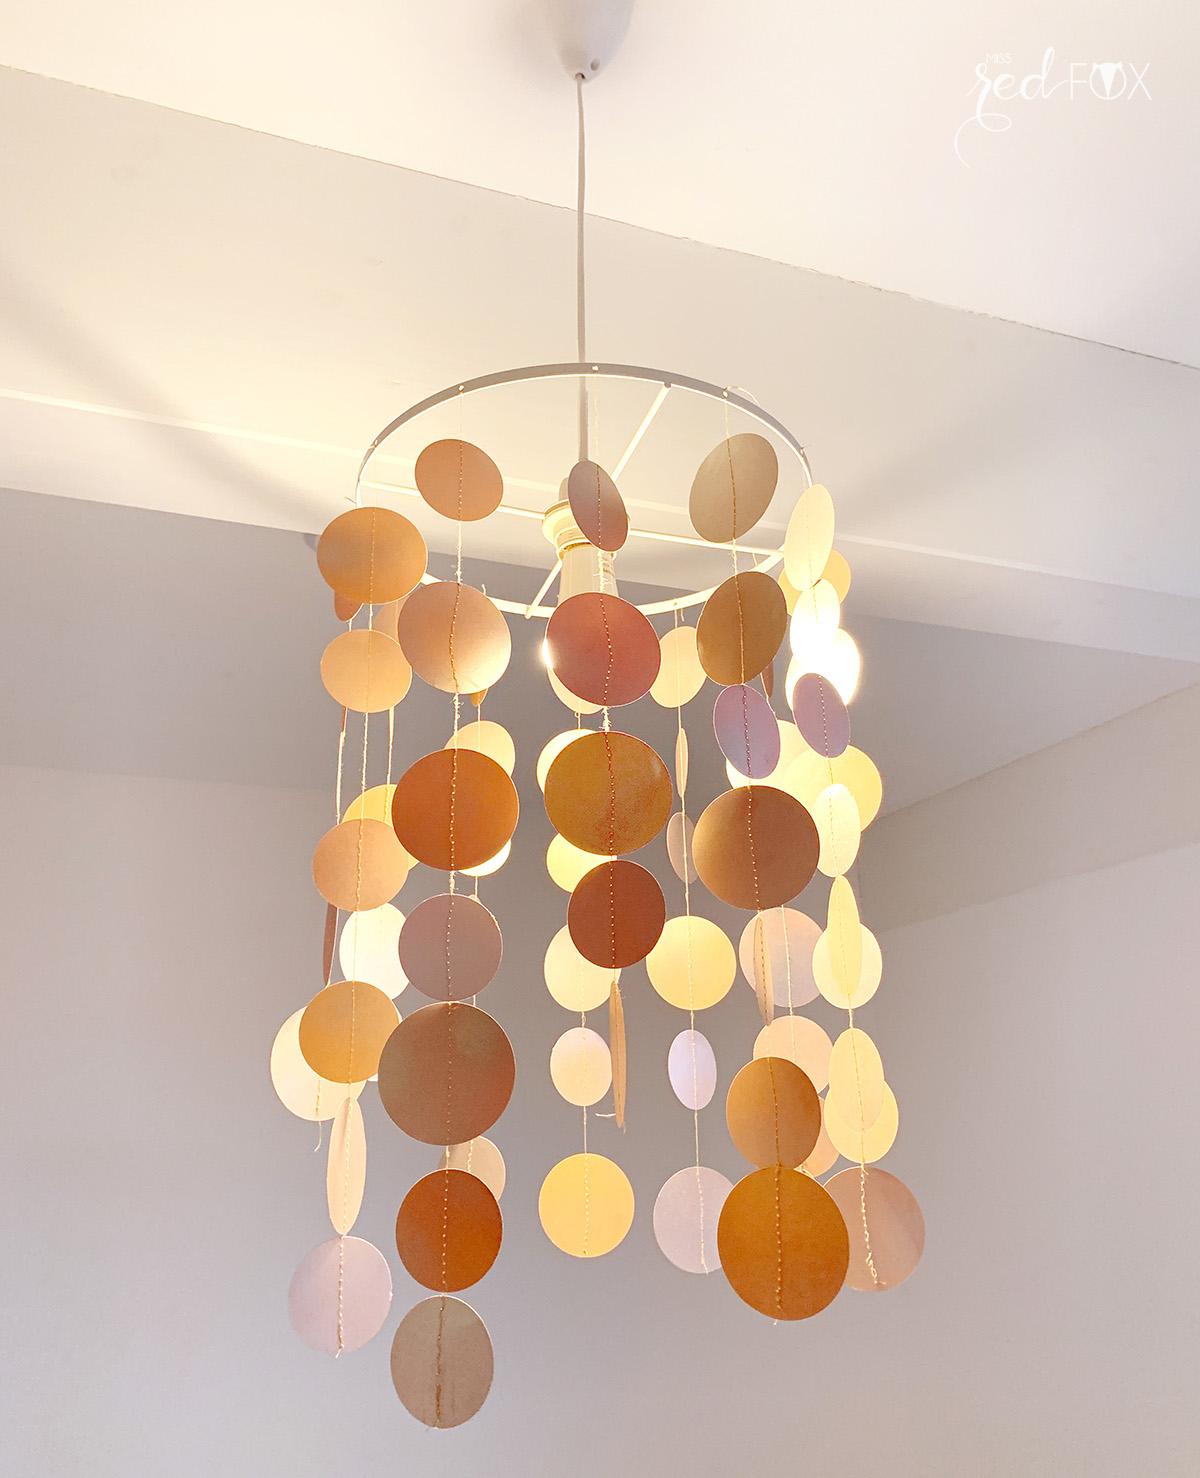 missredfox - Upcycling Kinderzimmer Lampe - 05